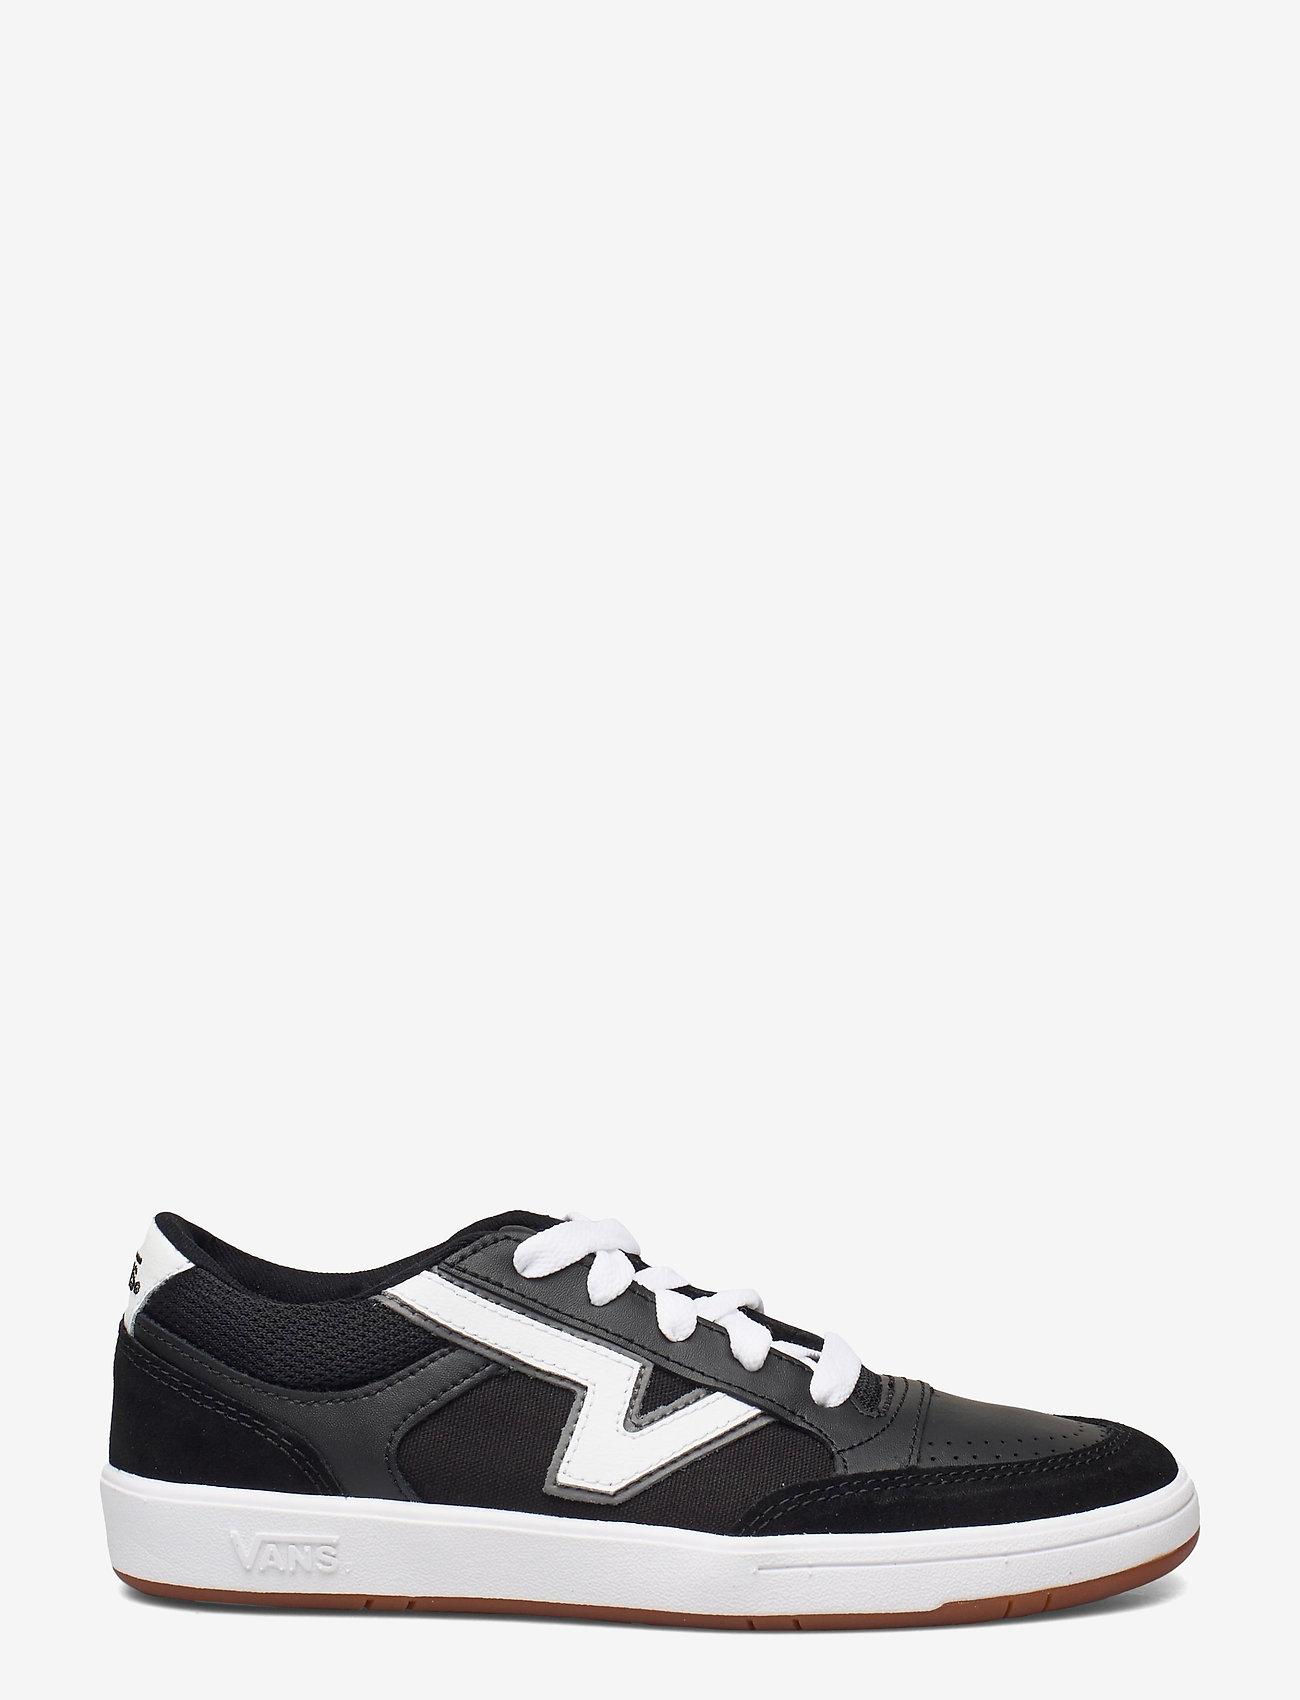 VANS - UA Lowland CC - laag sneakers - (staple) black/true white - 1